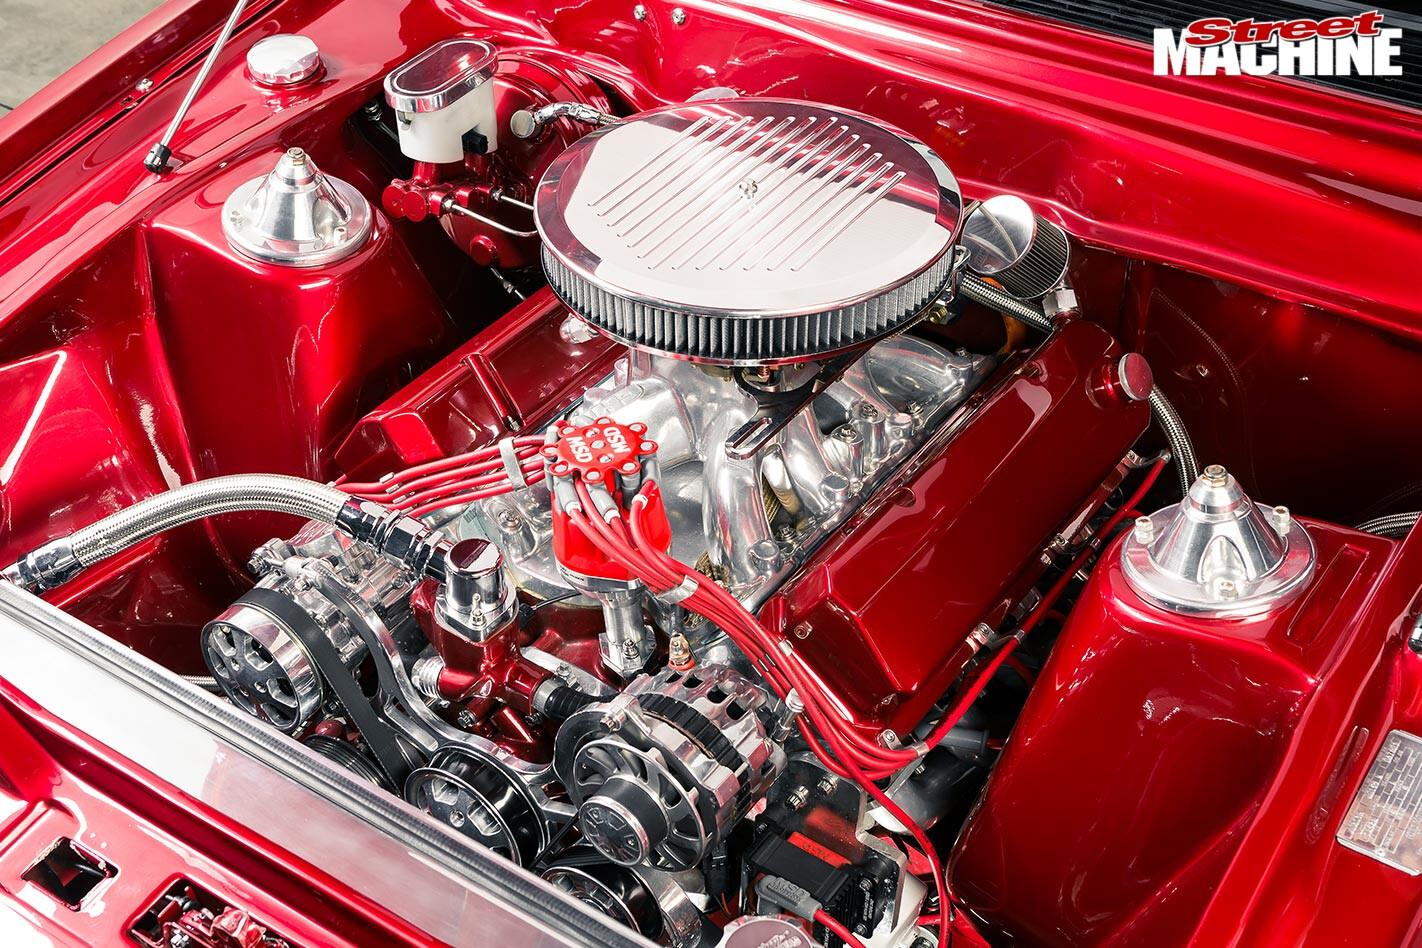 Ford XD Fairmont engine bay